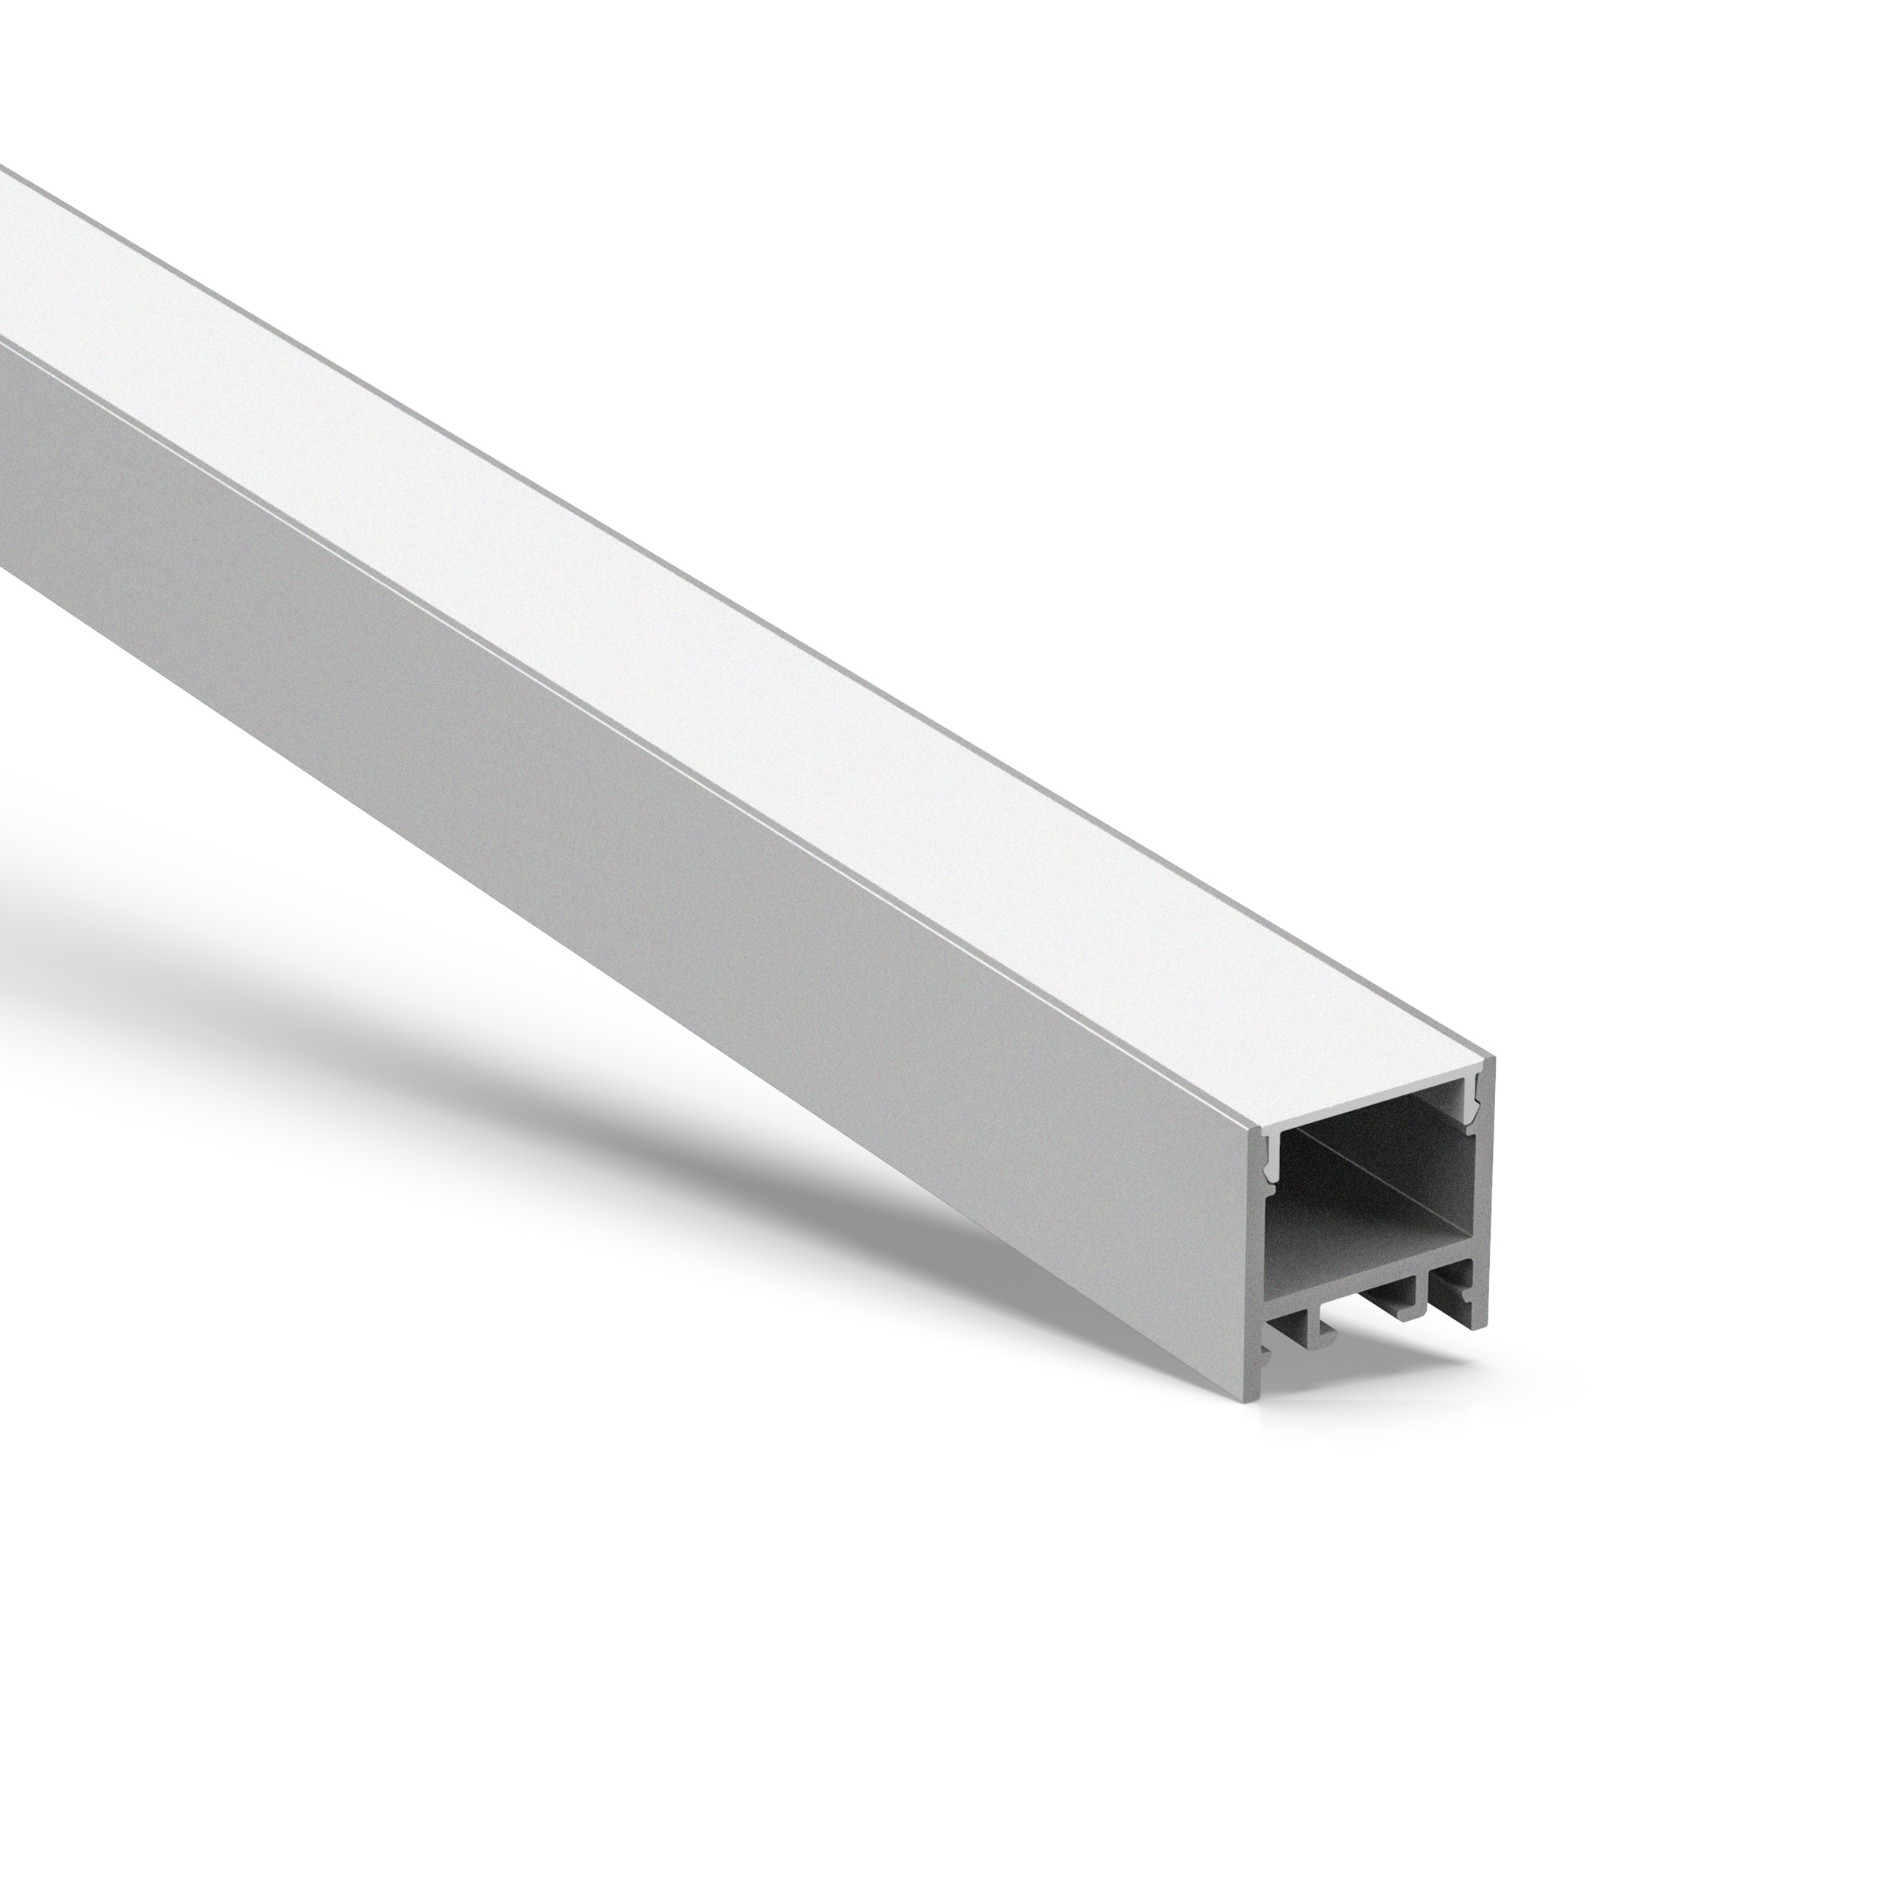 Perfil LED cuadrado de superficie US20 20x20mm